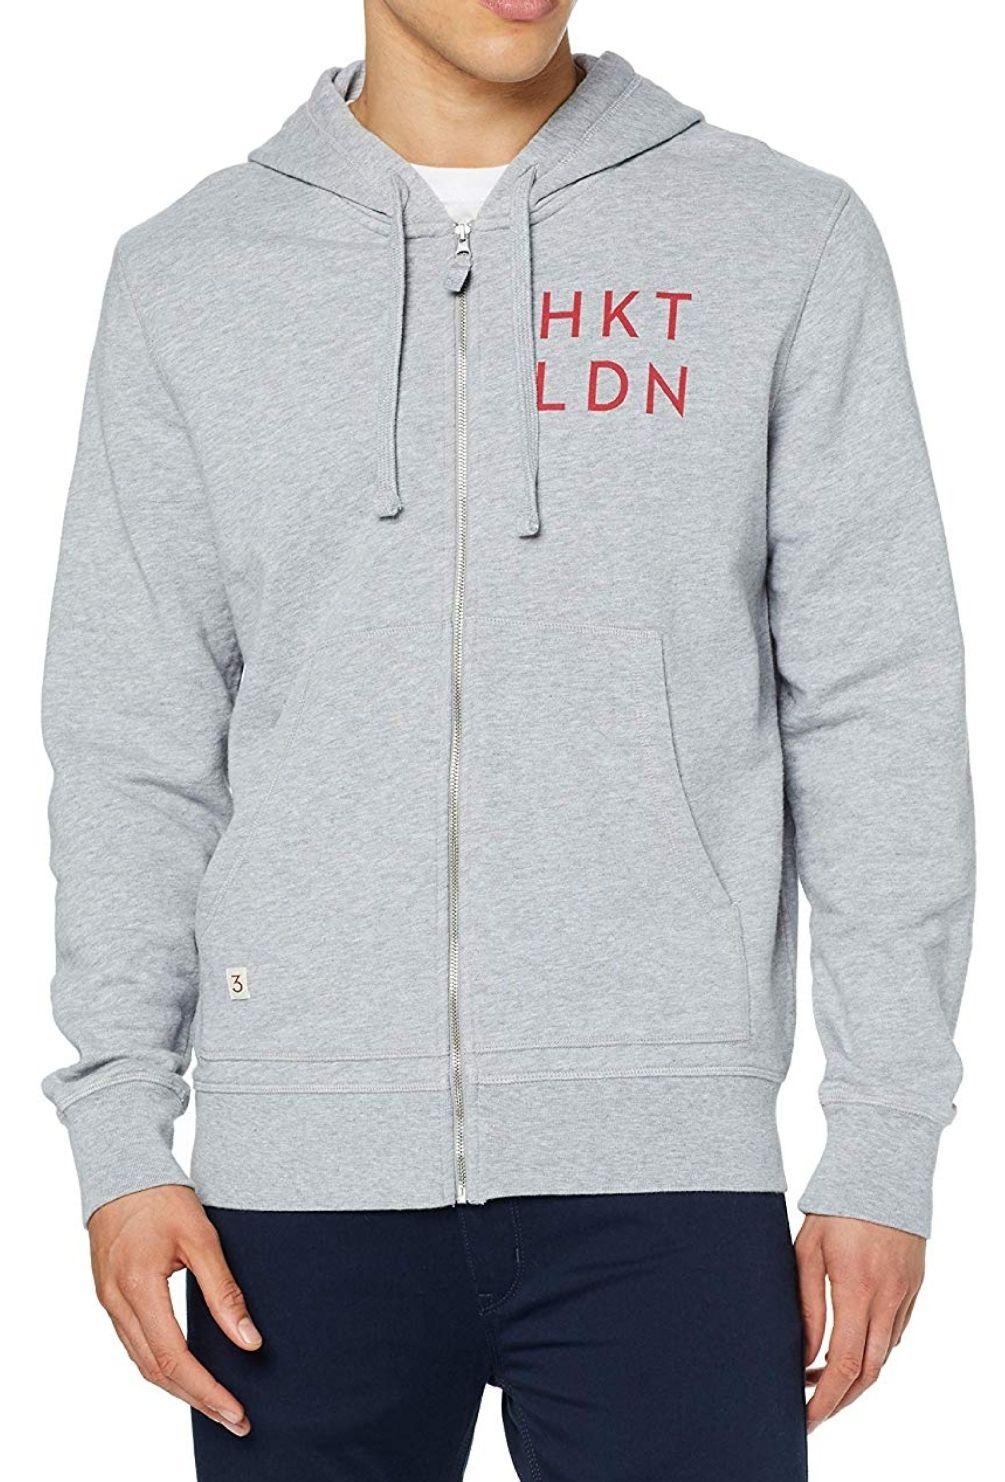 Sudadera HKT capucha gris Talla S